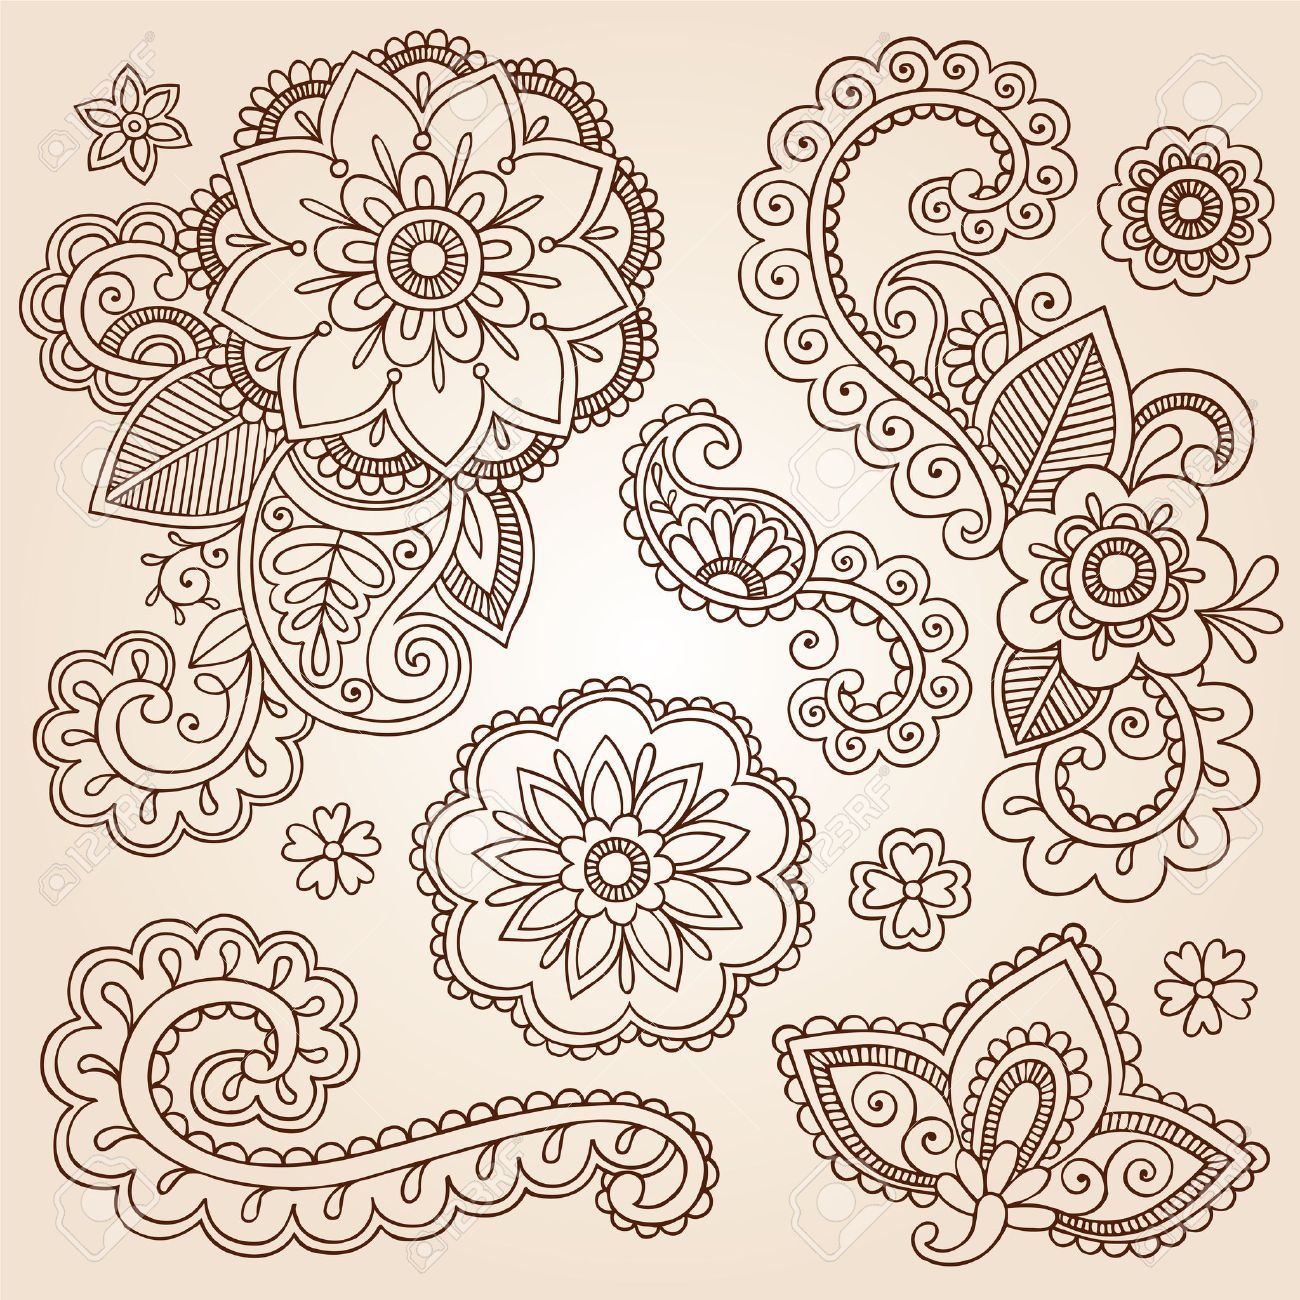 Henna Paisley Mandala Flowers Mehndi Tattoo Doodles Set Stock Vector - 15940000